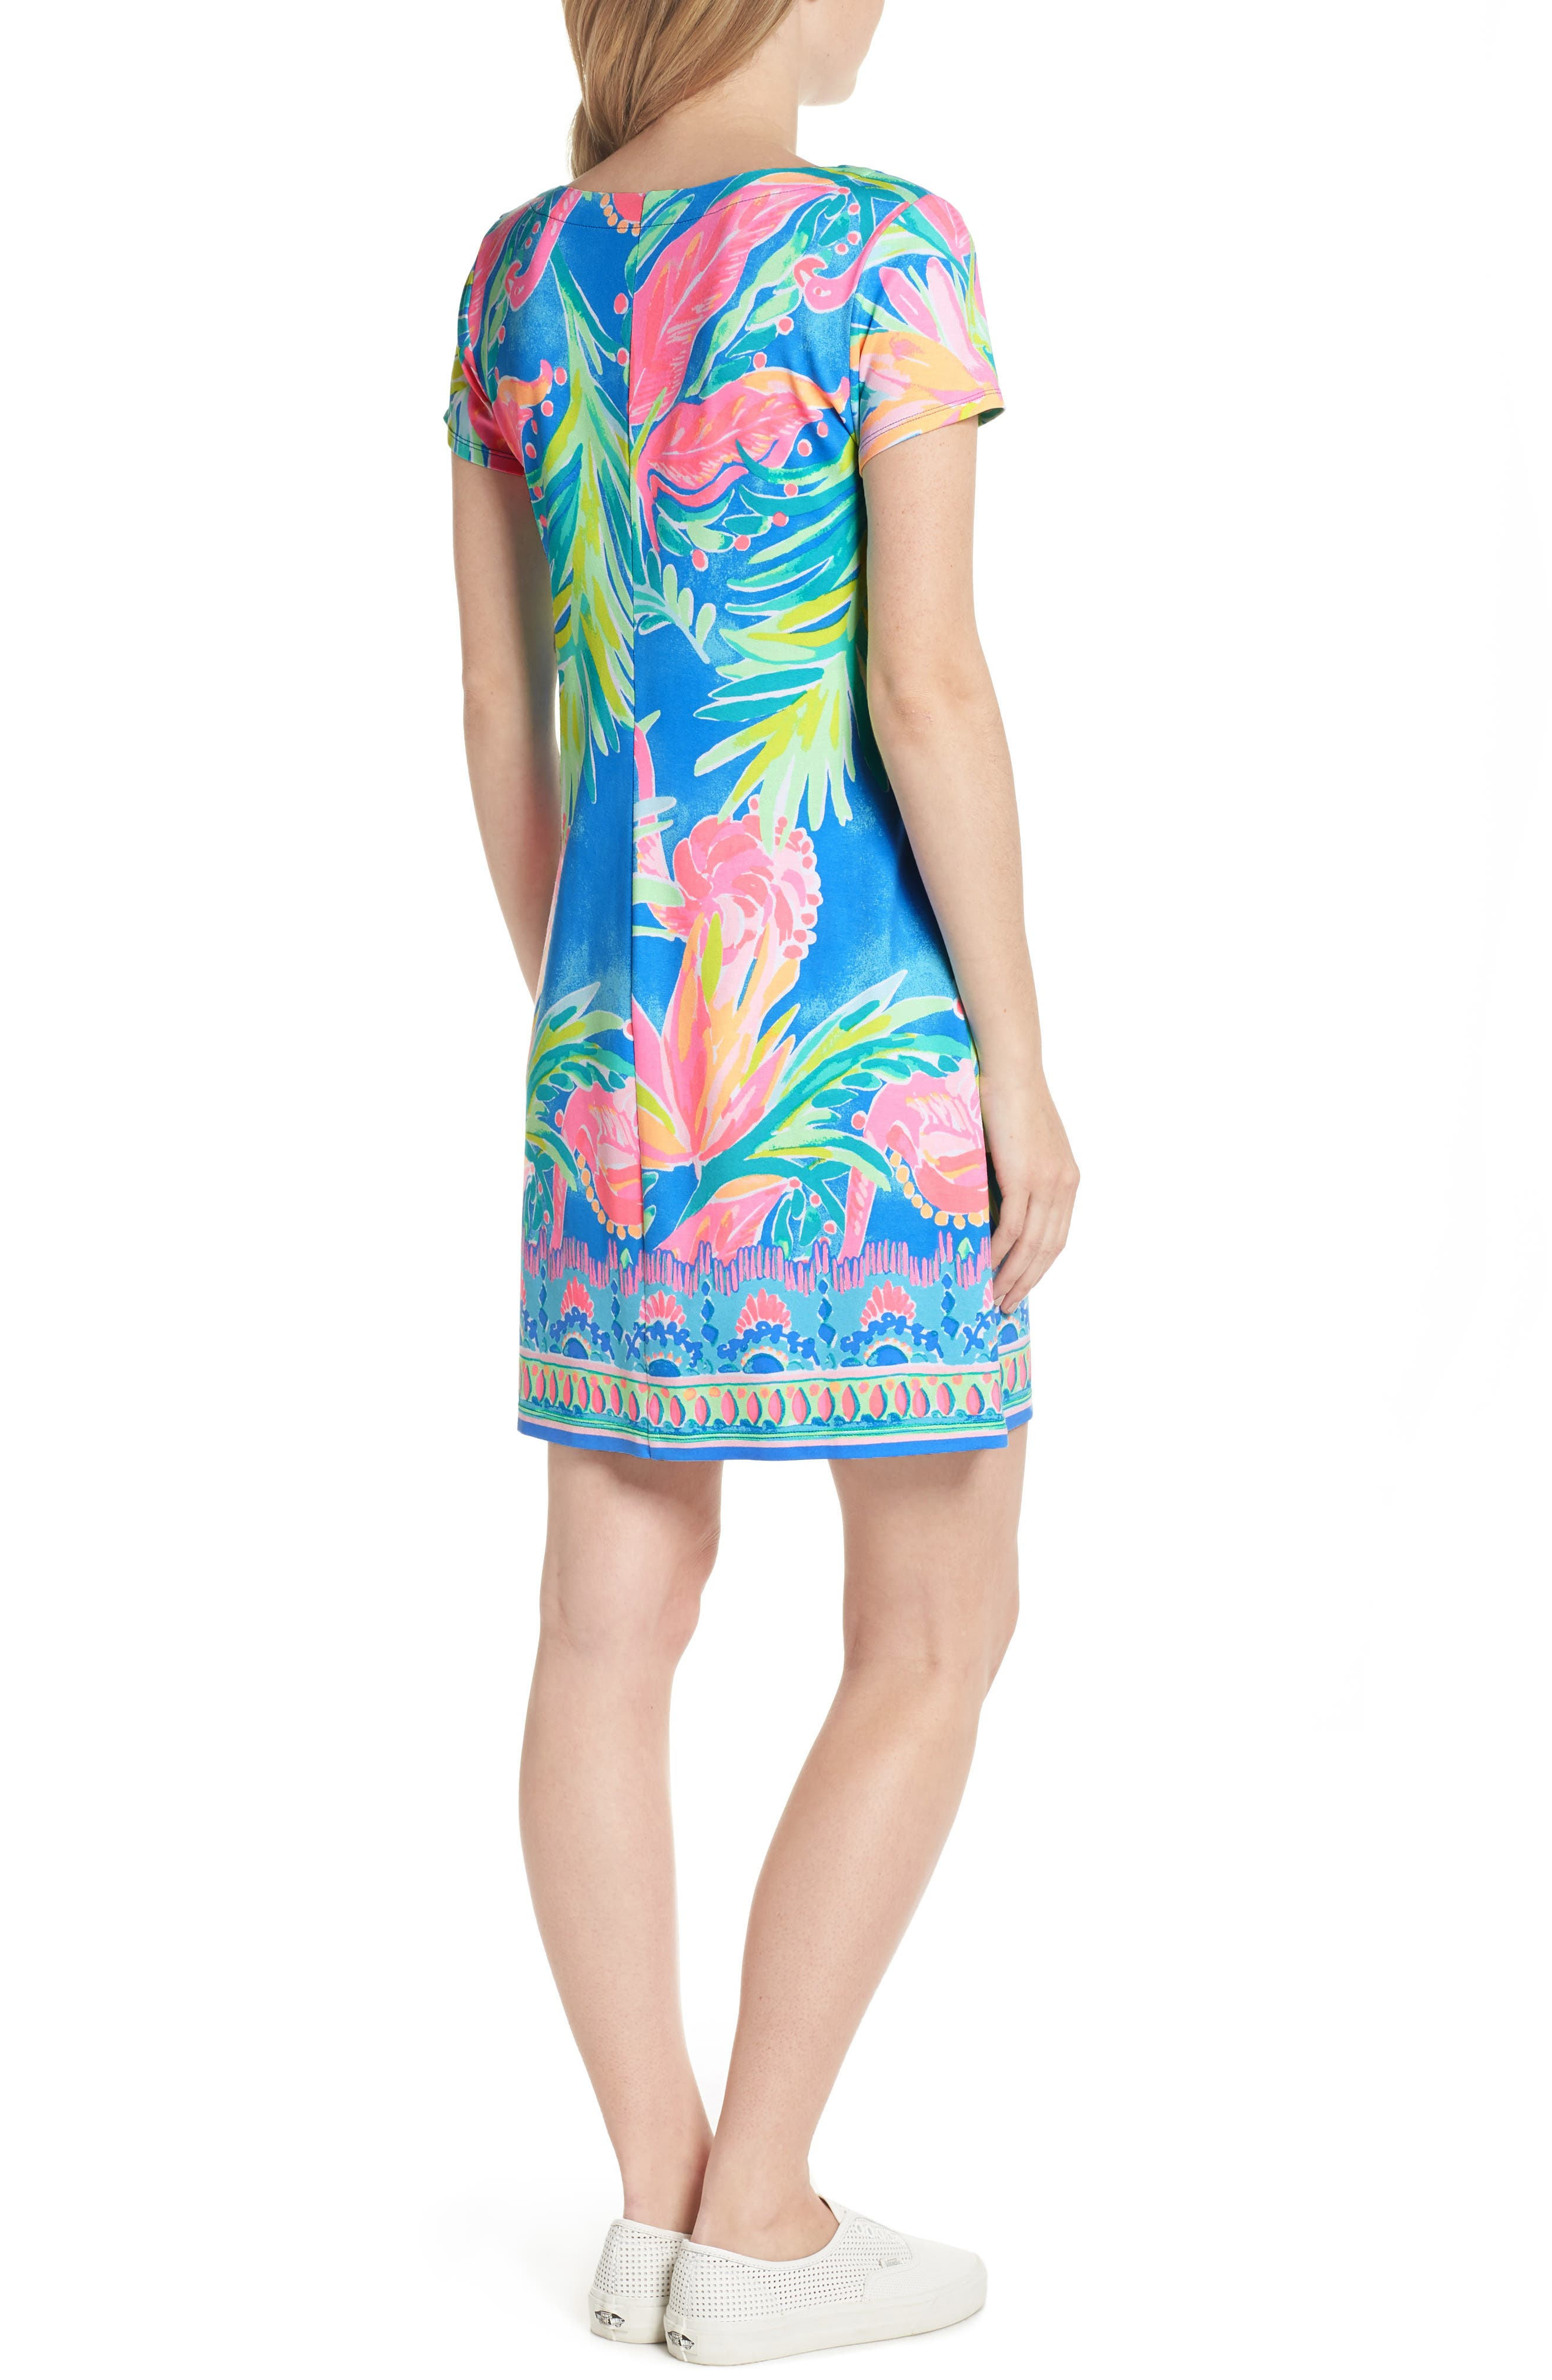 Sophiletta UPF 50+ Dress,                             Alternate thumbnail 2, color,                             420